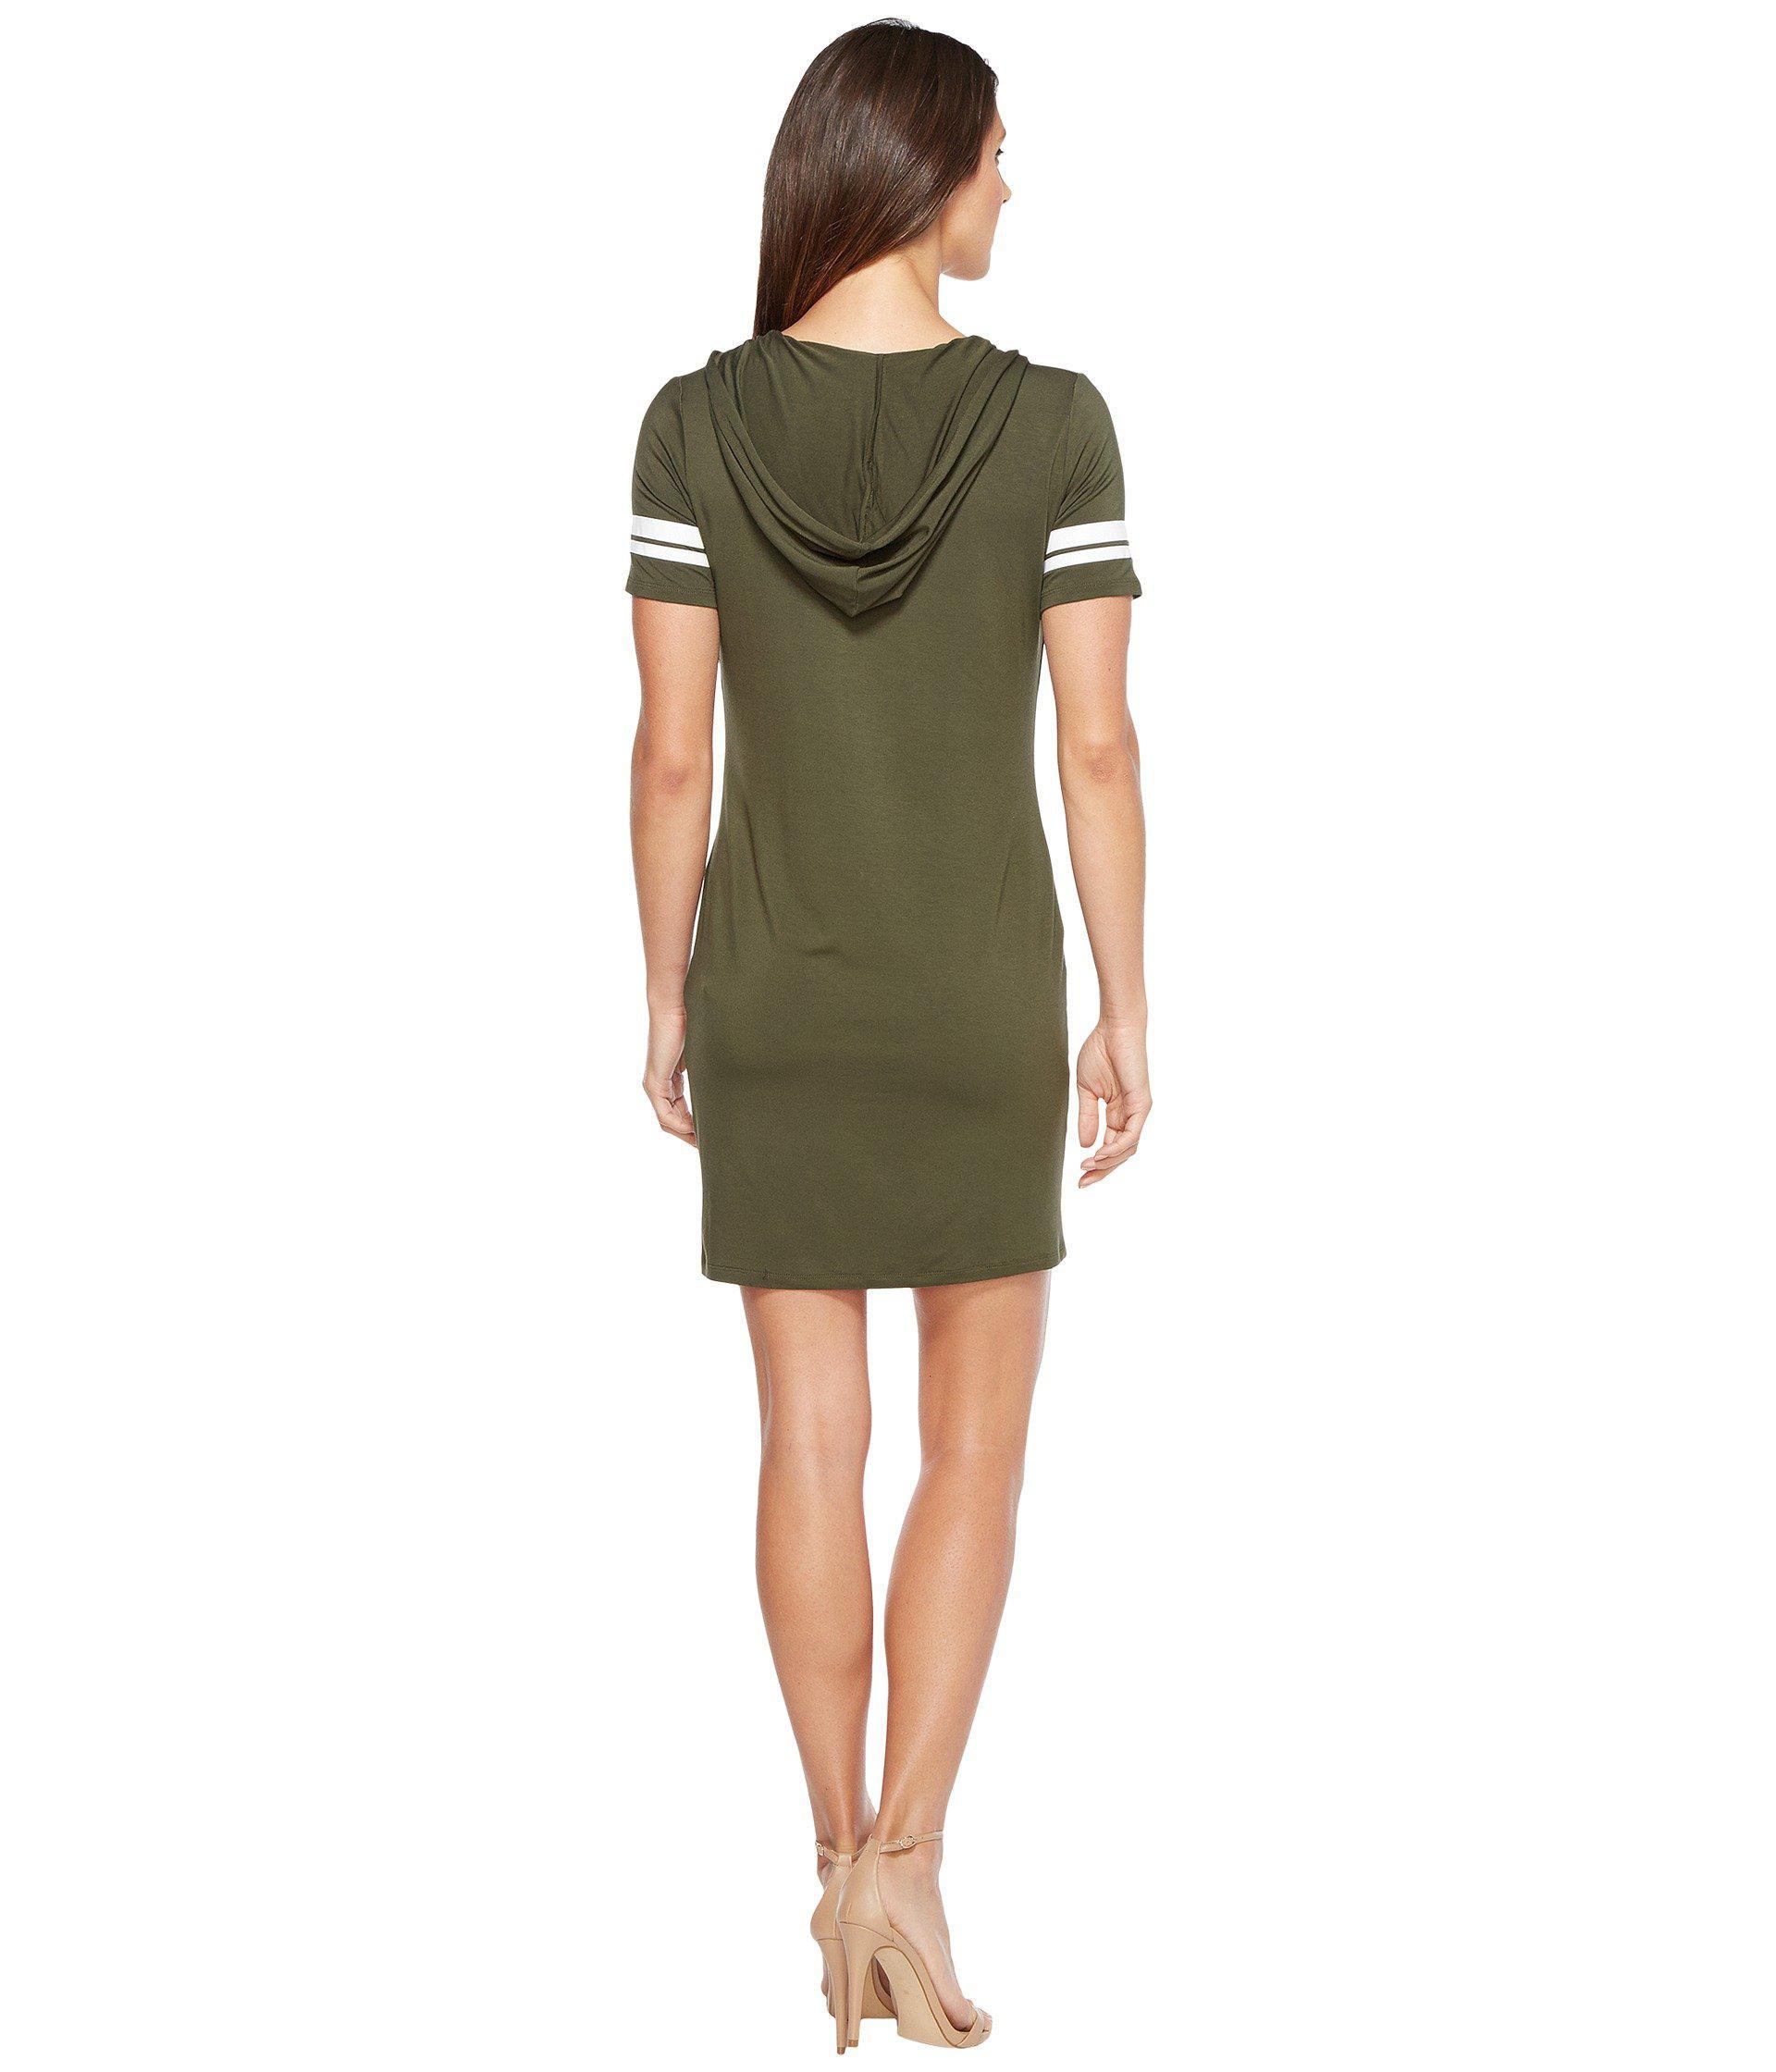 4c8b3ce7f34 Lyst - MICHAEL Michael Kors Stripe Short Sleeve Hoodie Dress in Green